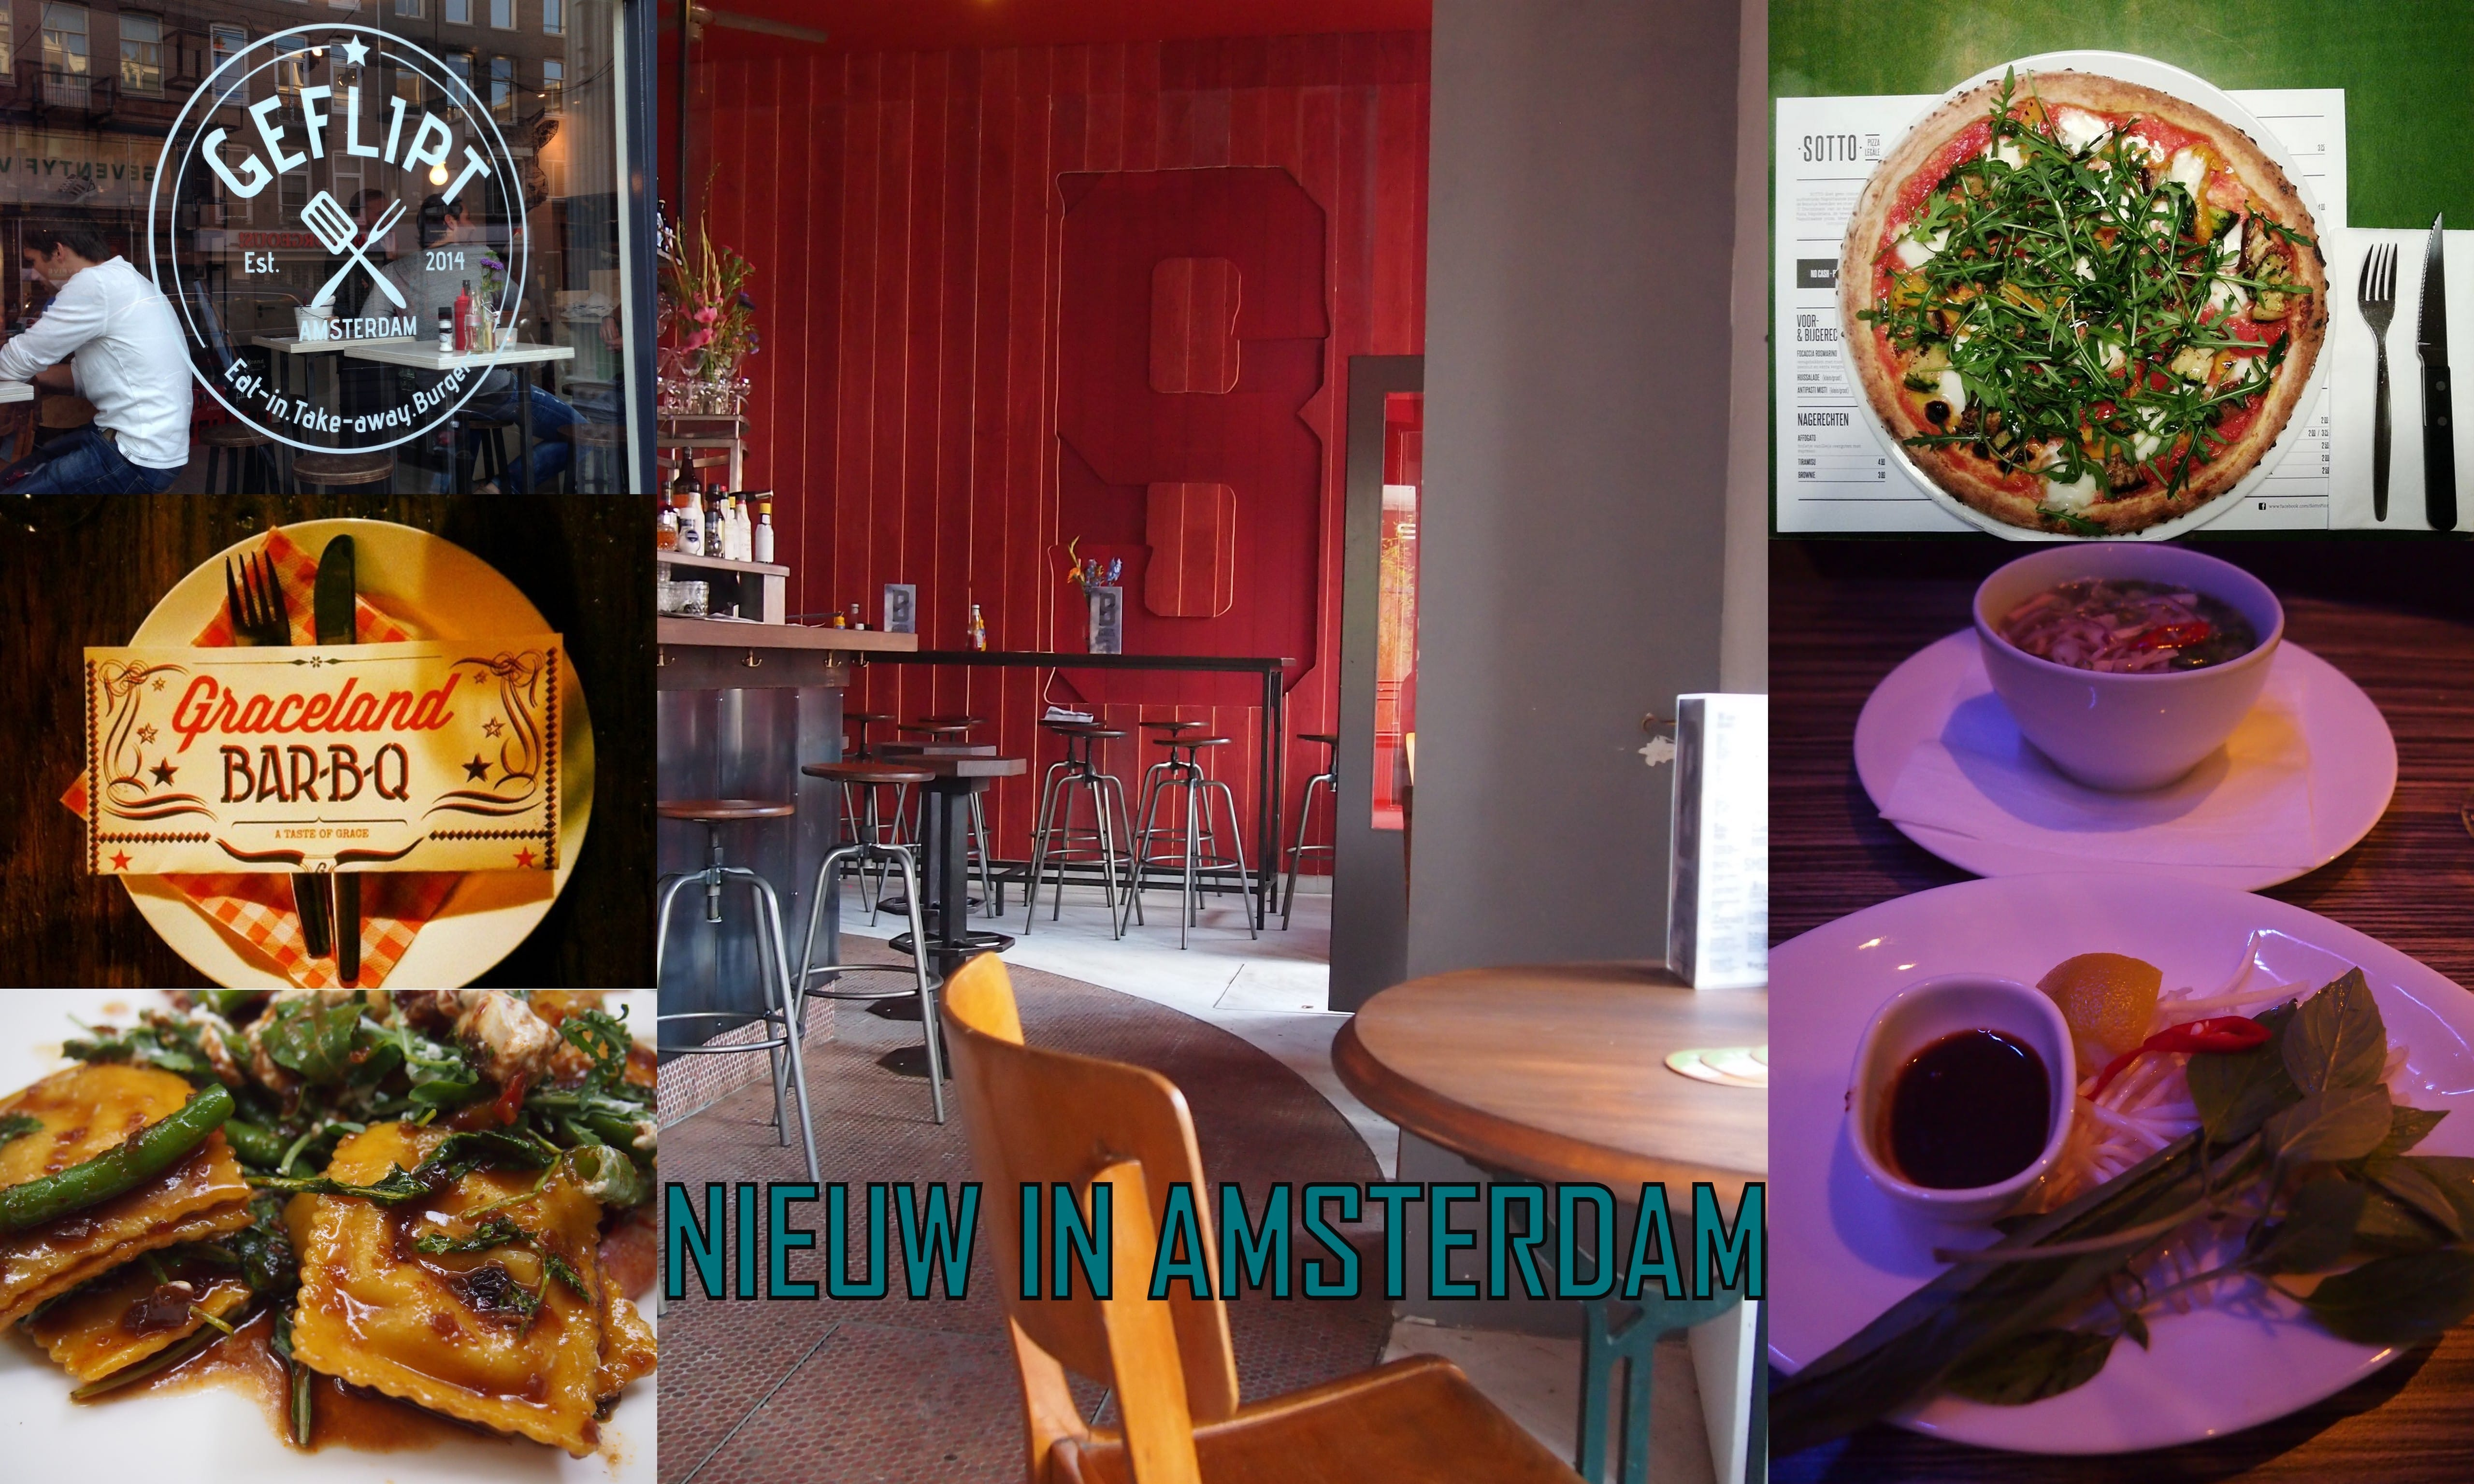 Nieuw in amsterdam restaurant bysam for Nieuwe restaurants amsterdam